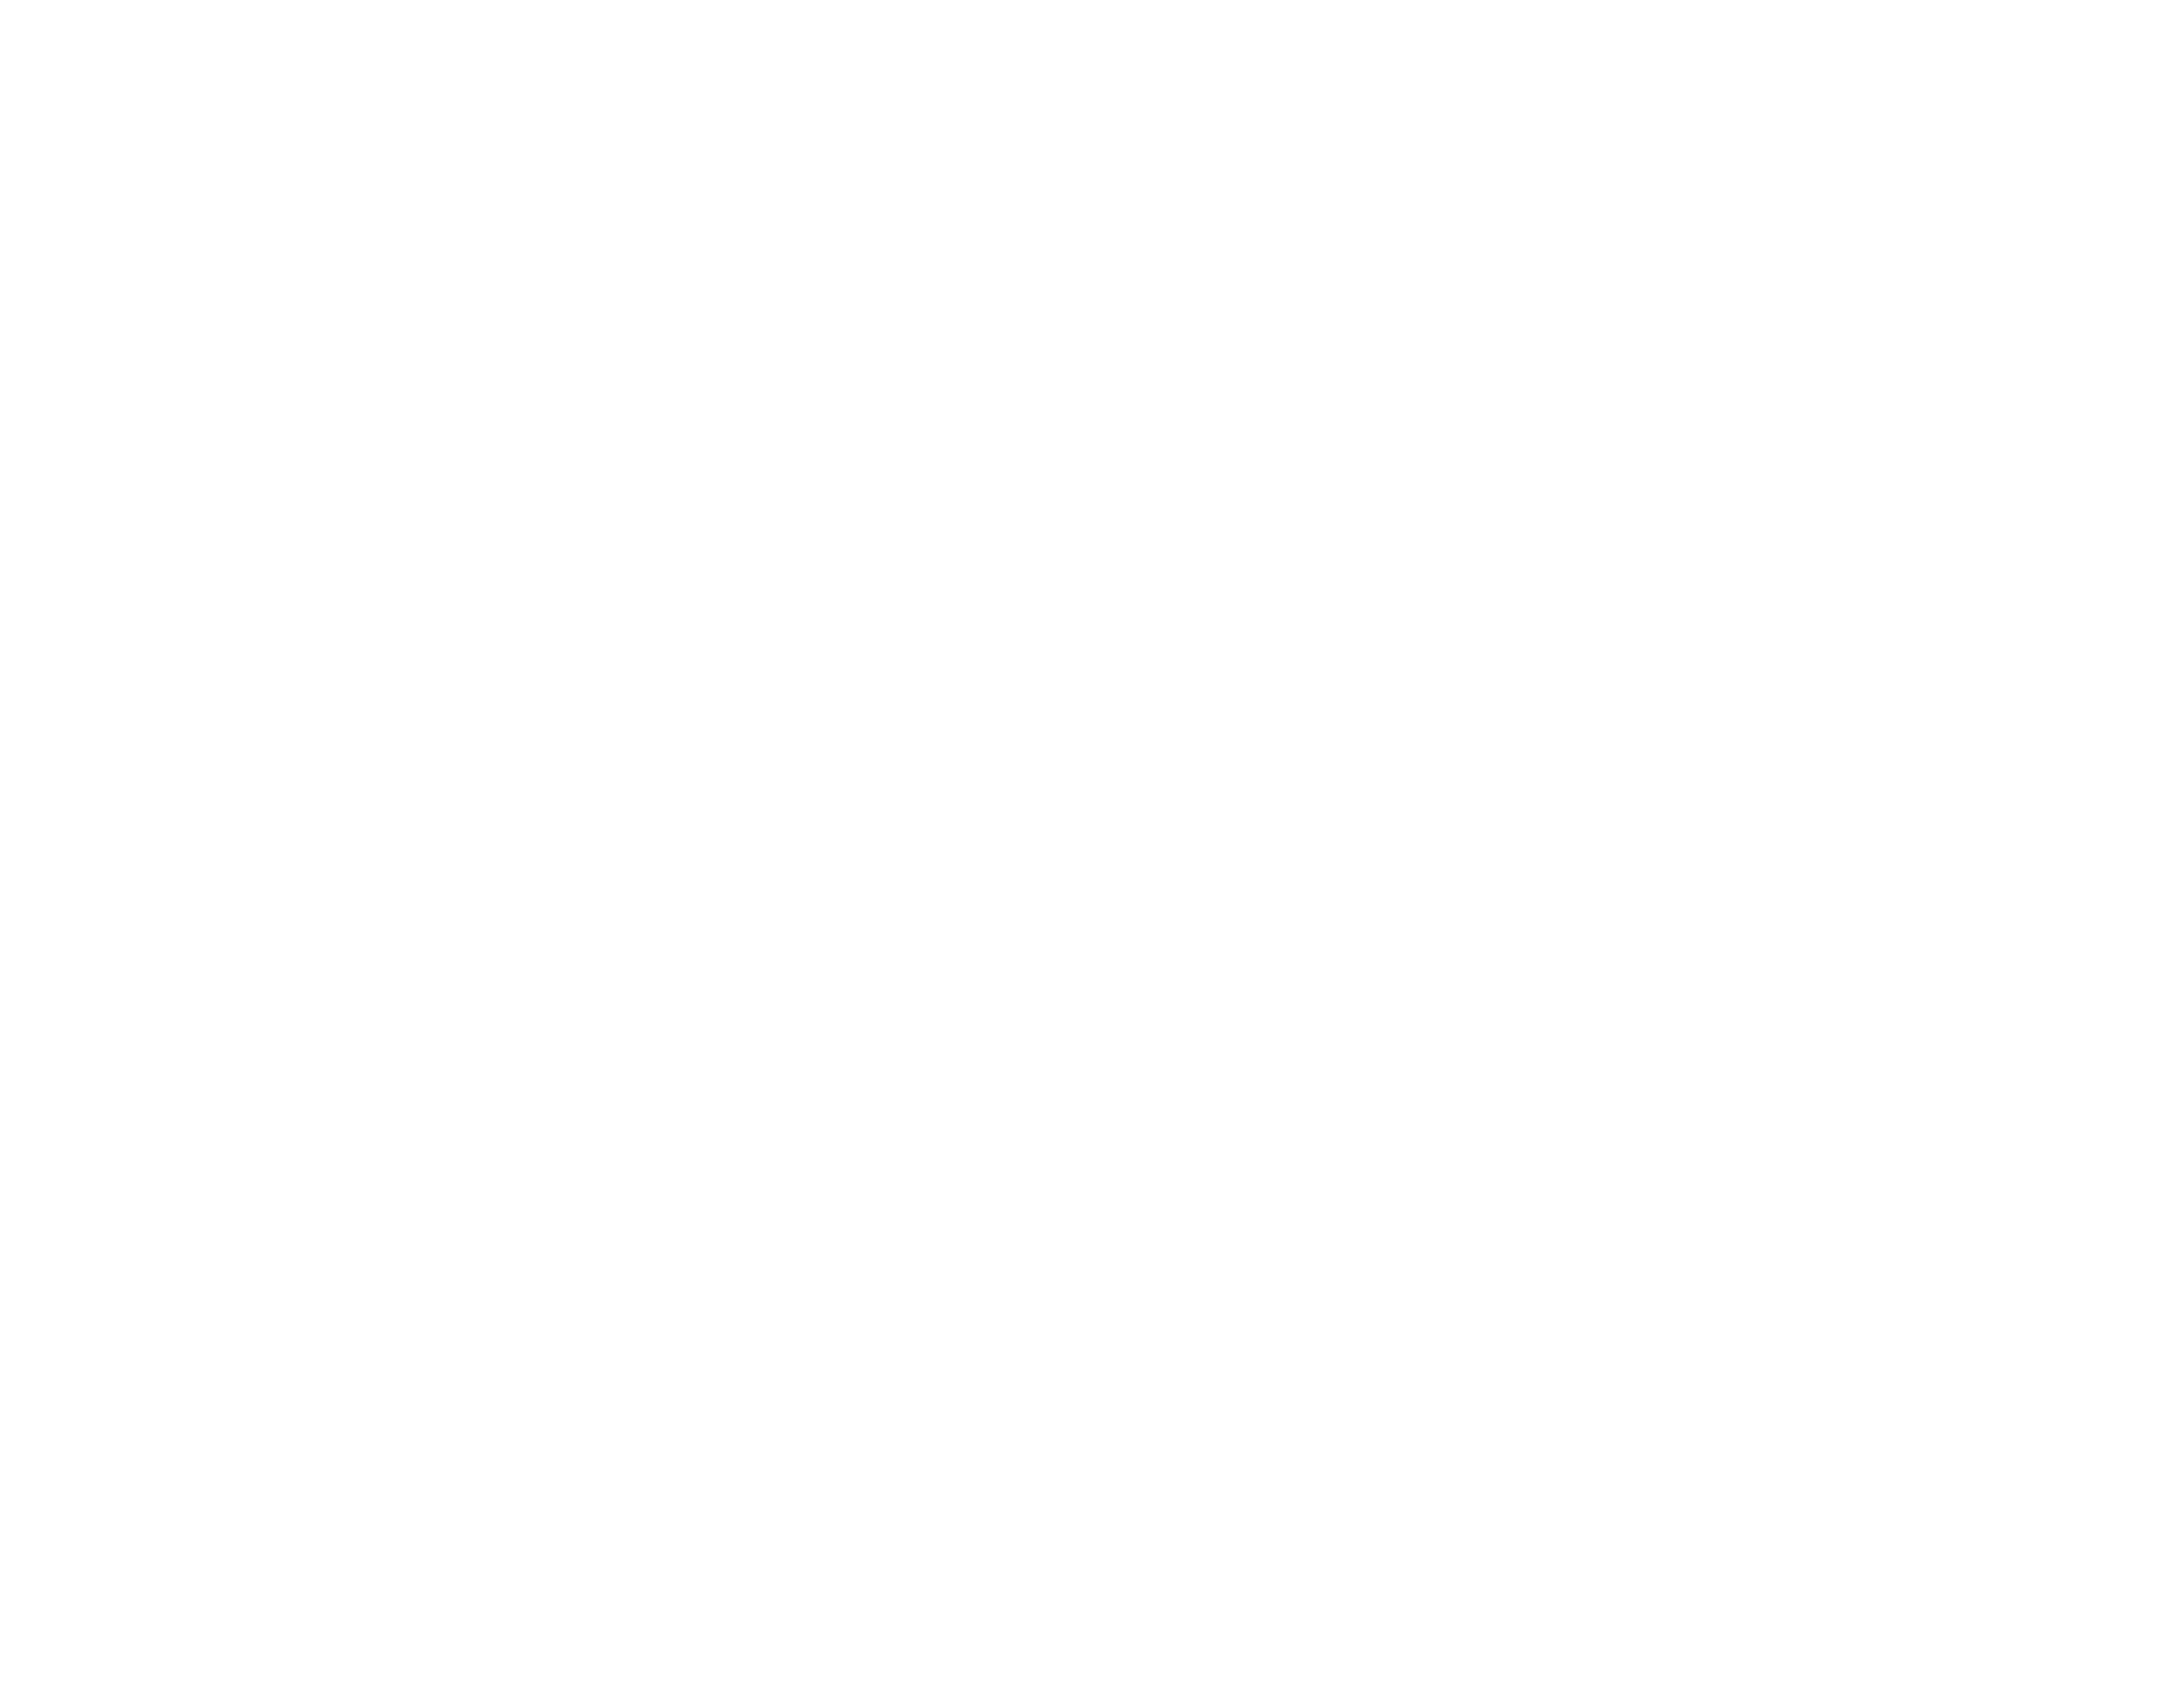 ElleryBonhamLogo